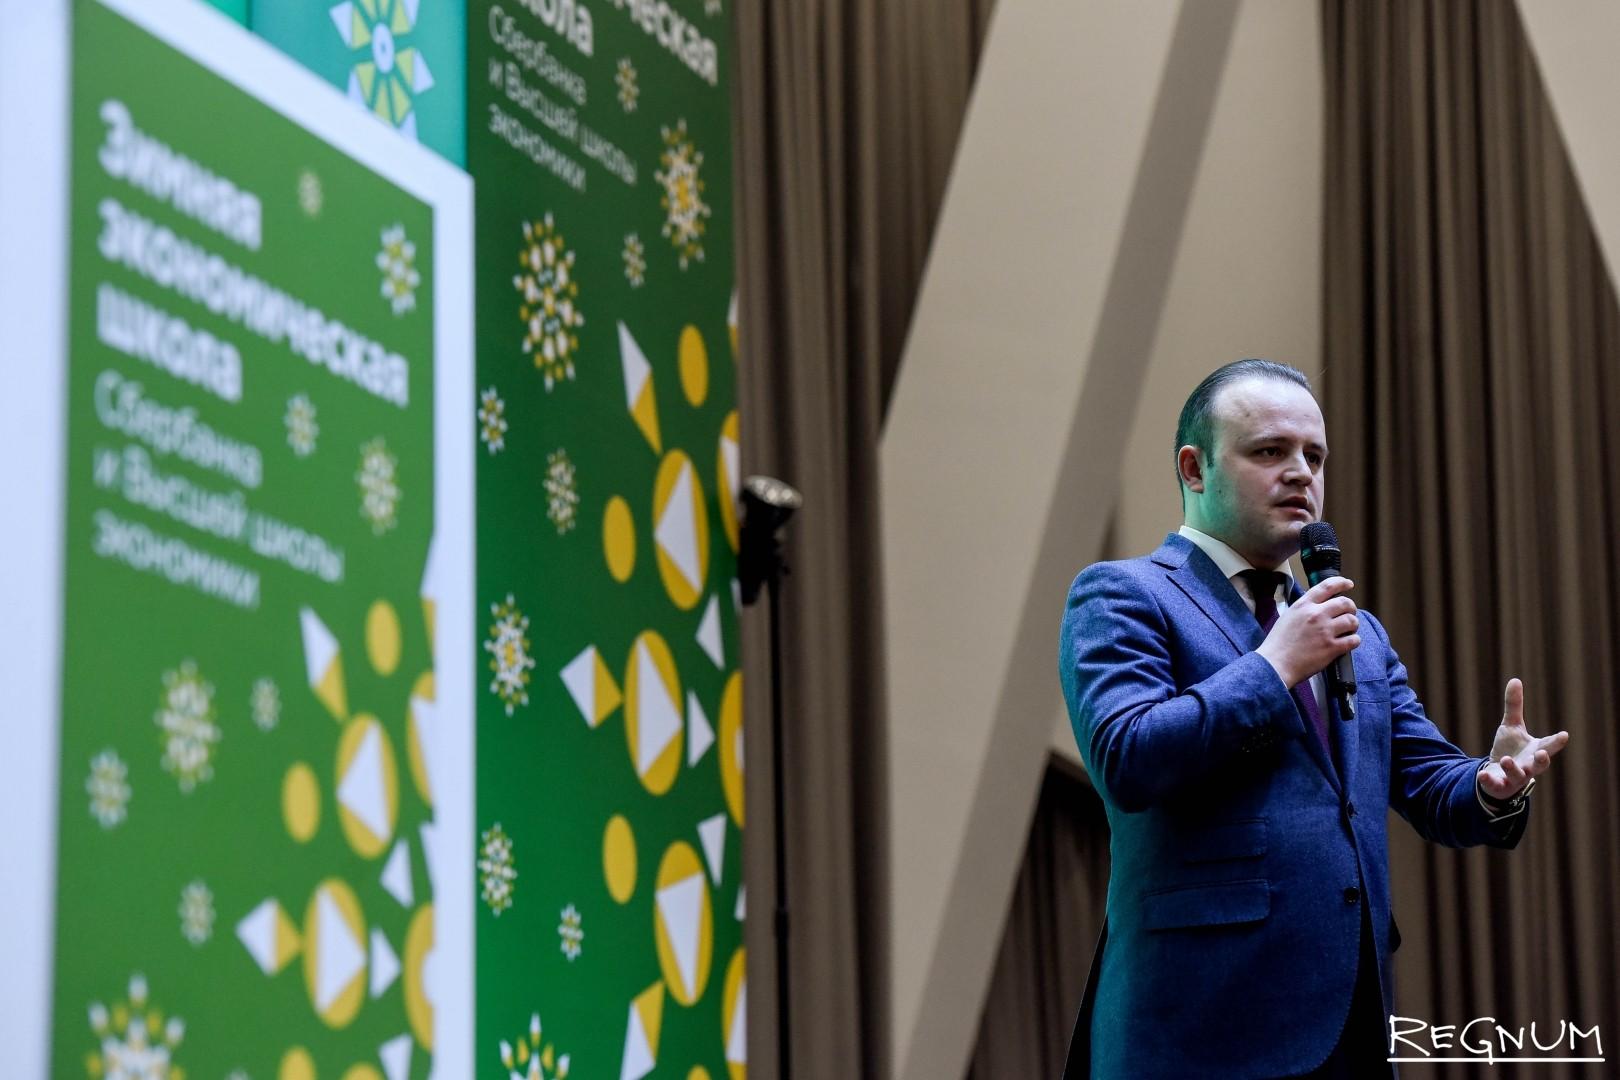 Владислав Даванков во время церемонии награждения